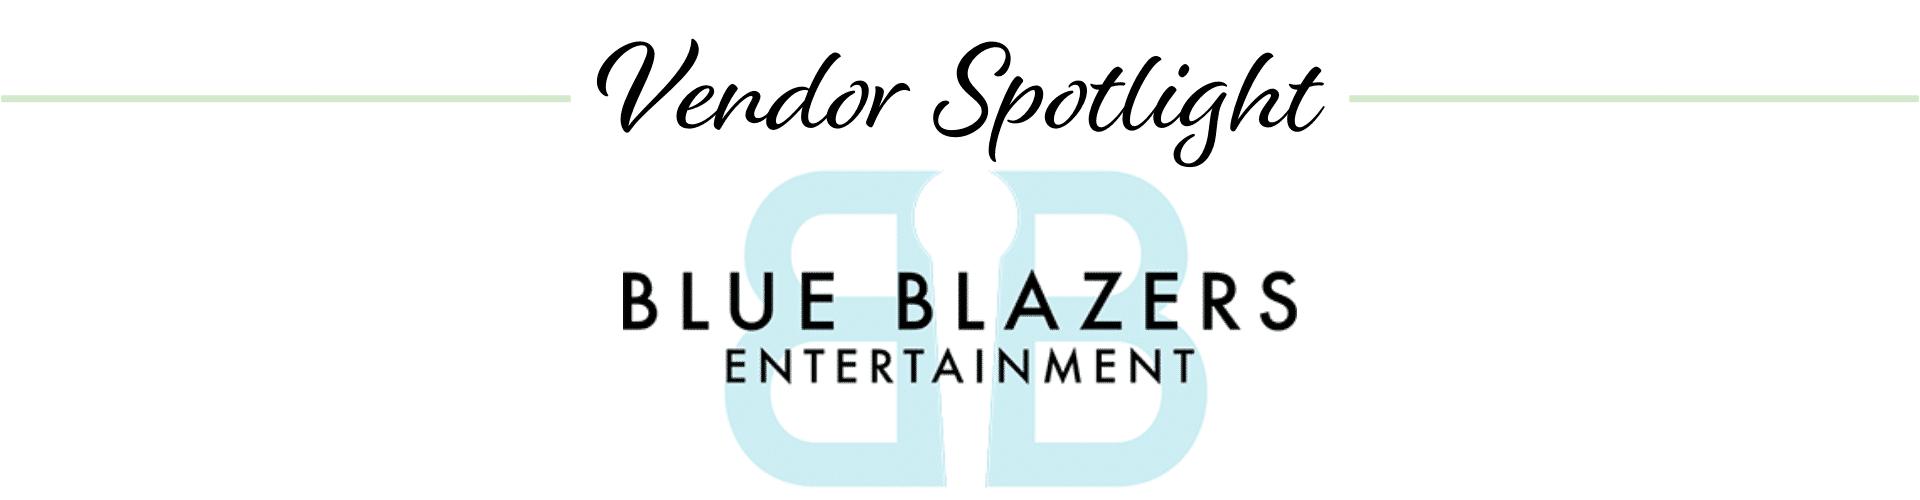 Blue Blazers Entertainment logo